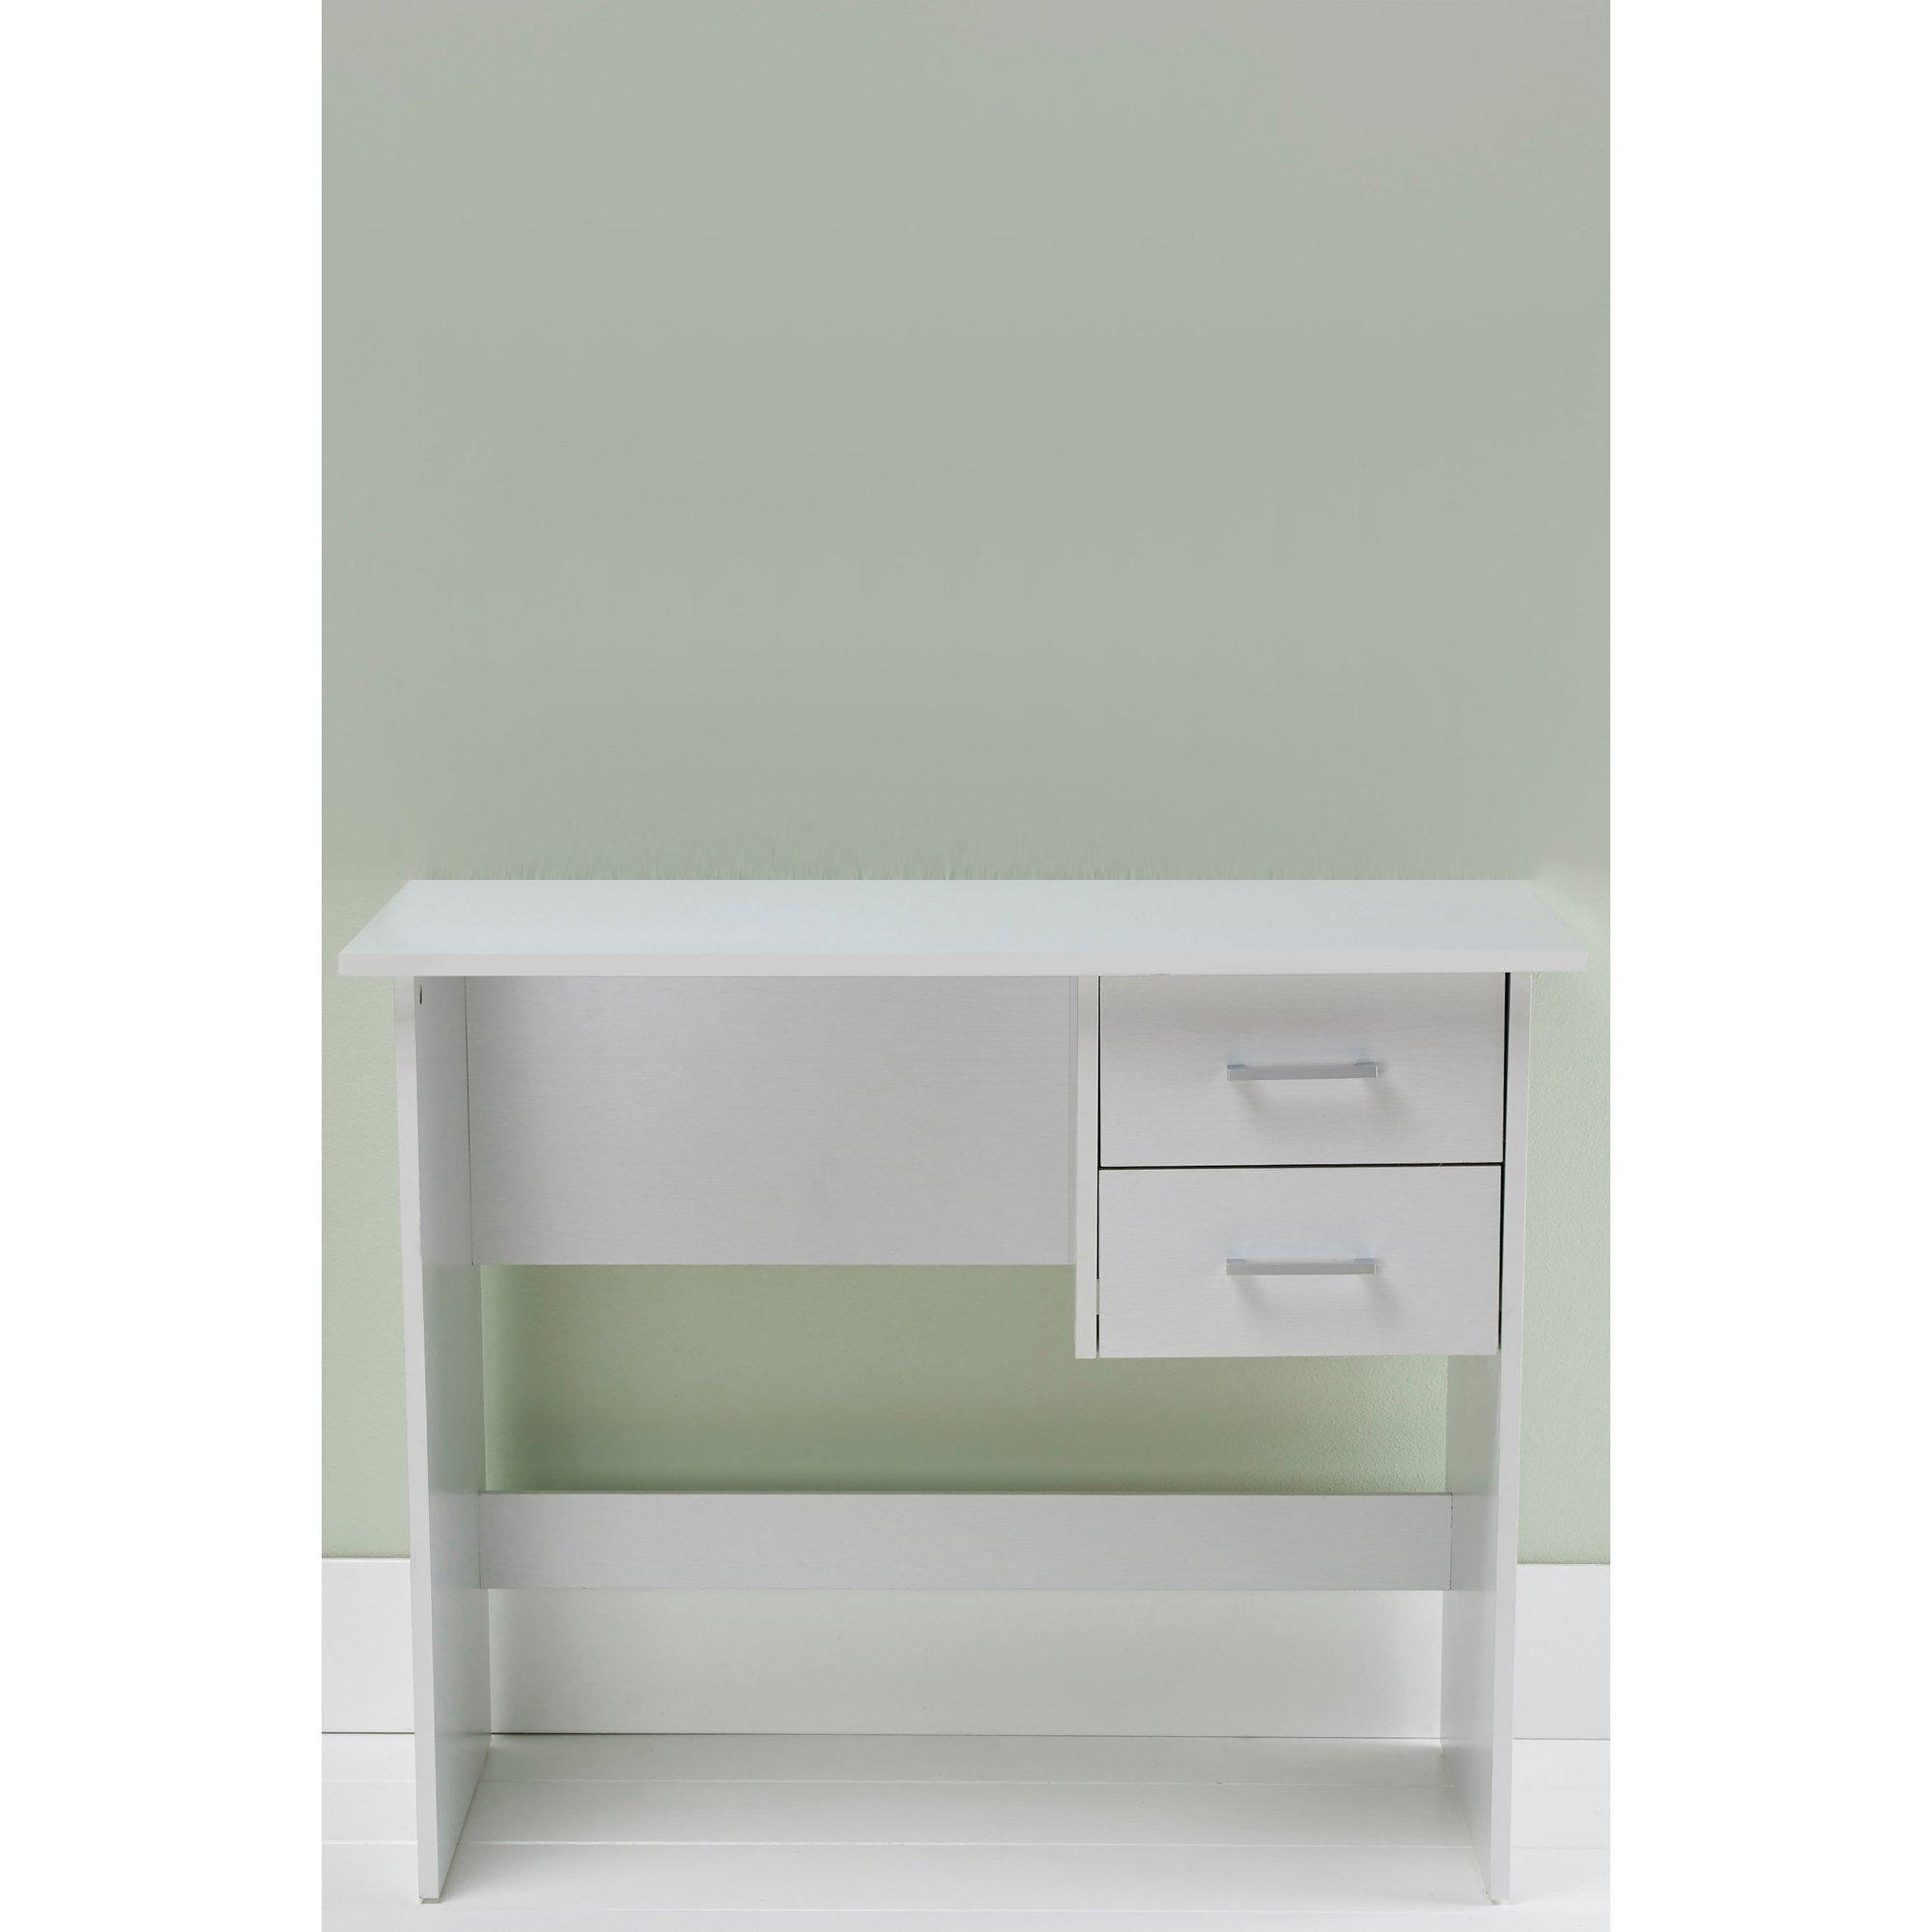 Image of 2 Drawer Desk/Dressing Table